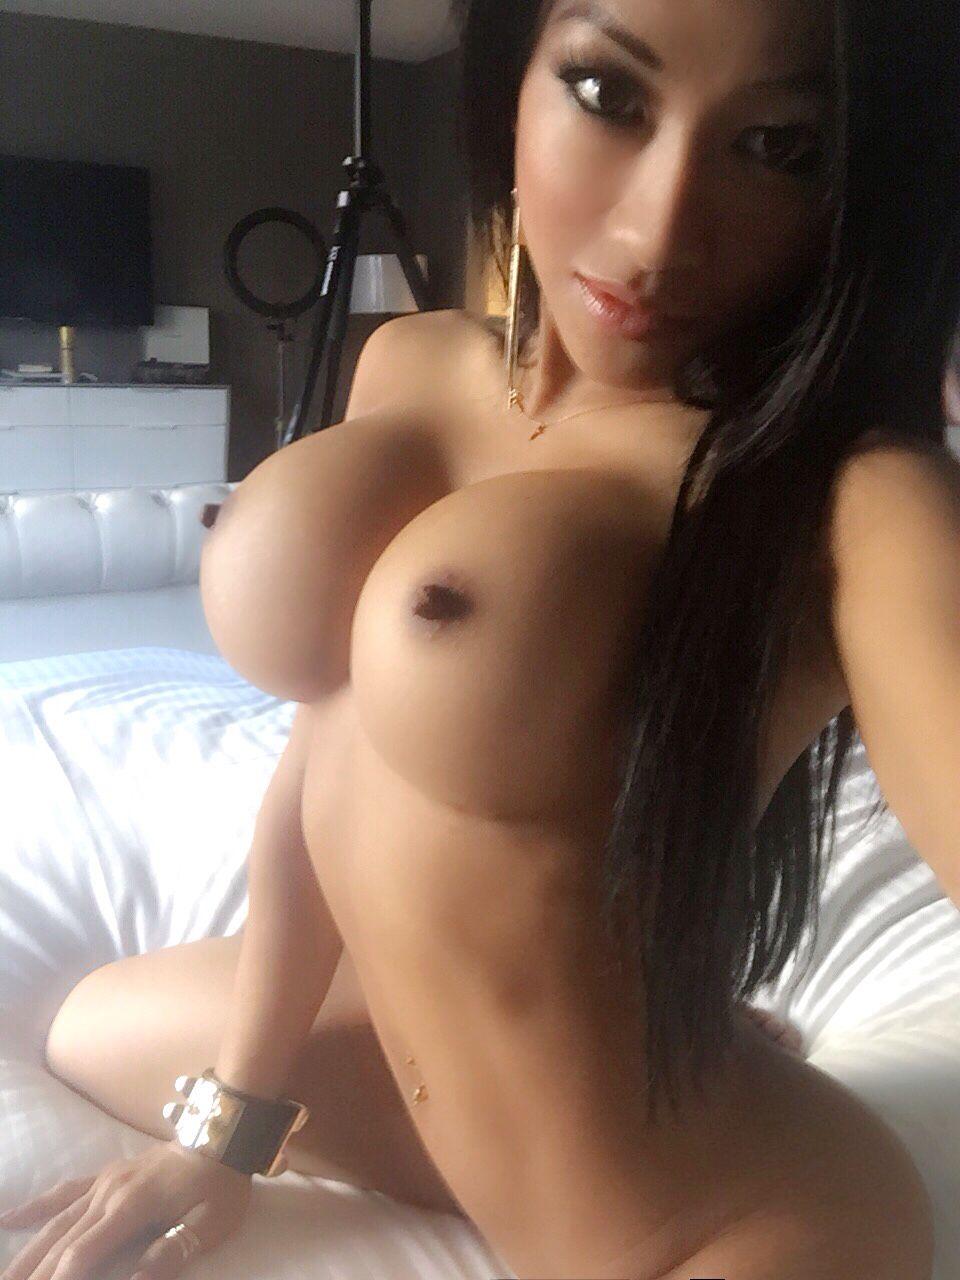 cassie v nude